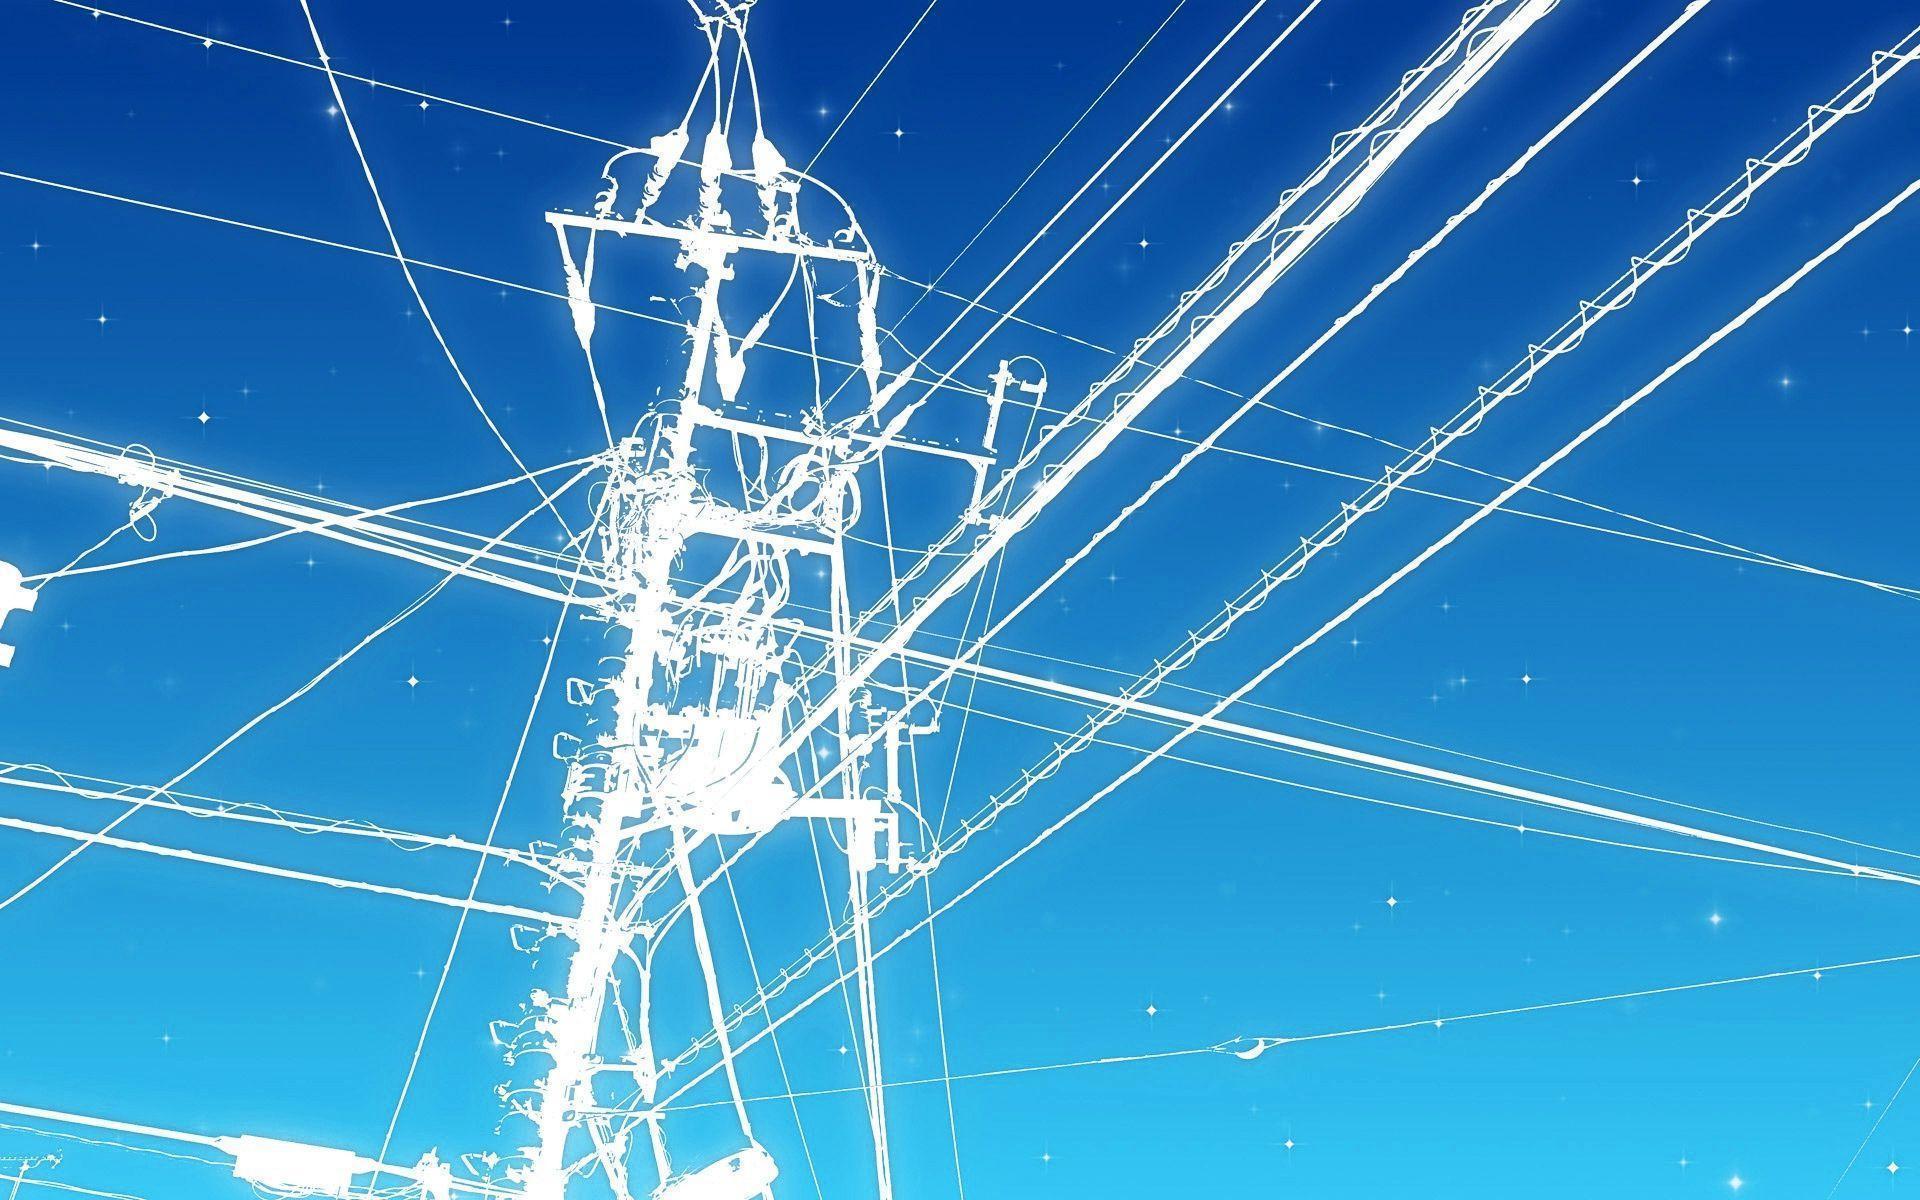 Electrical Engineering Wallpaper Hd